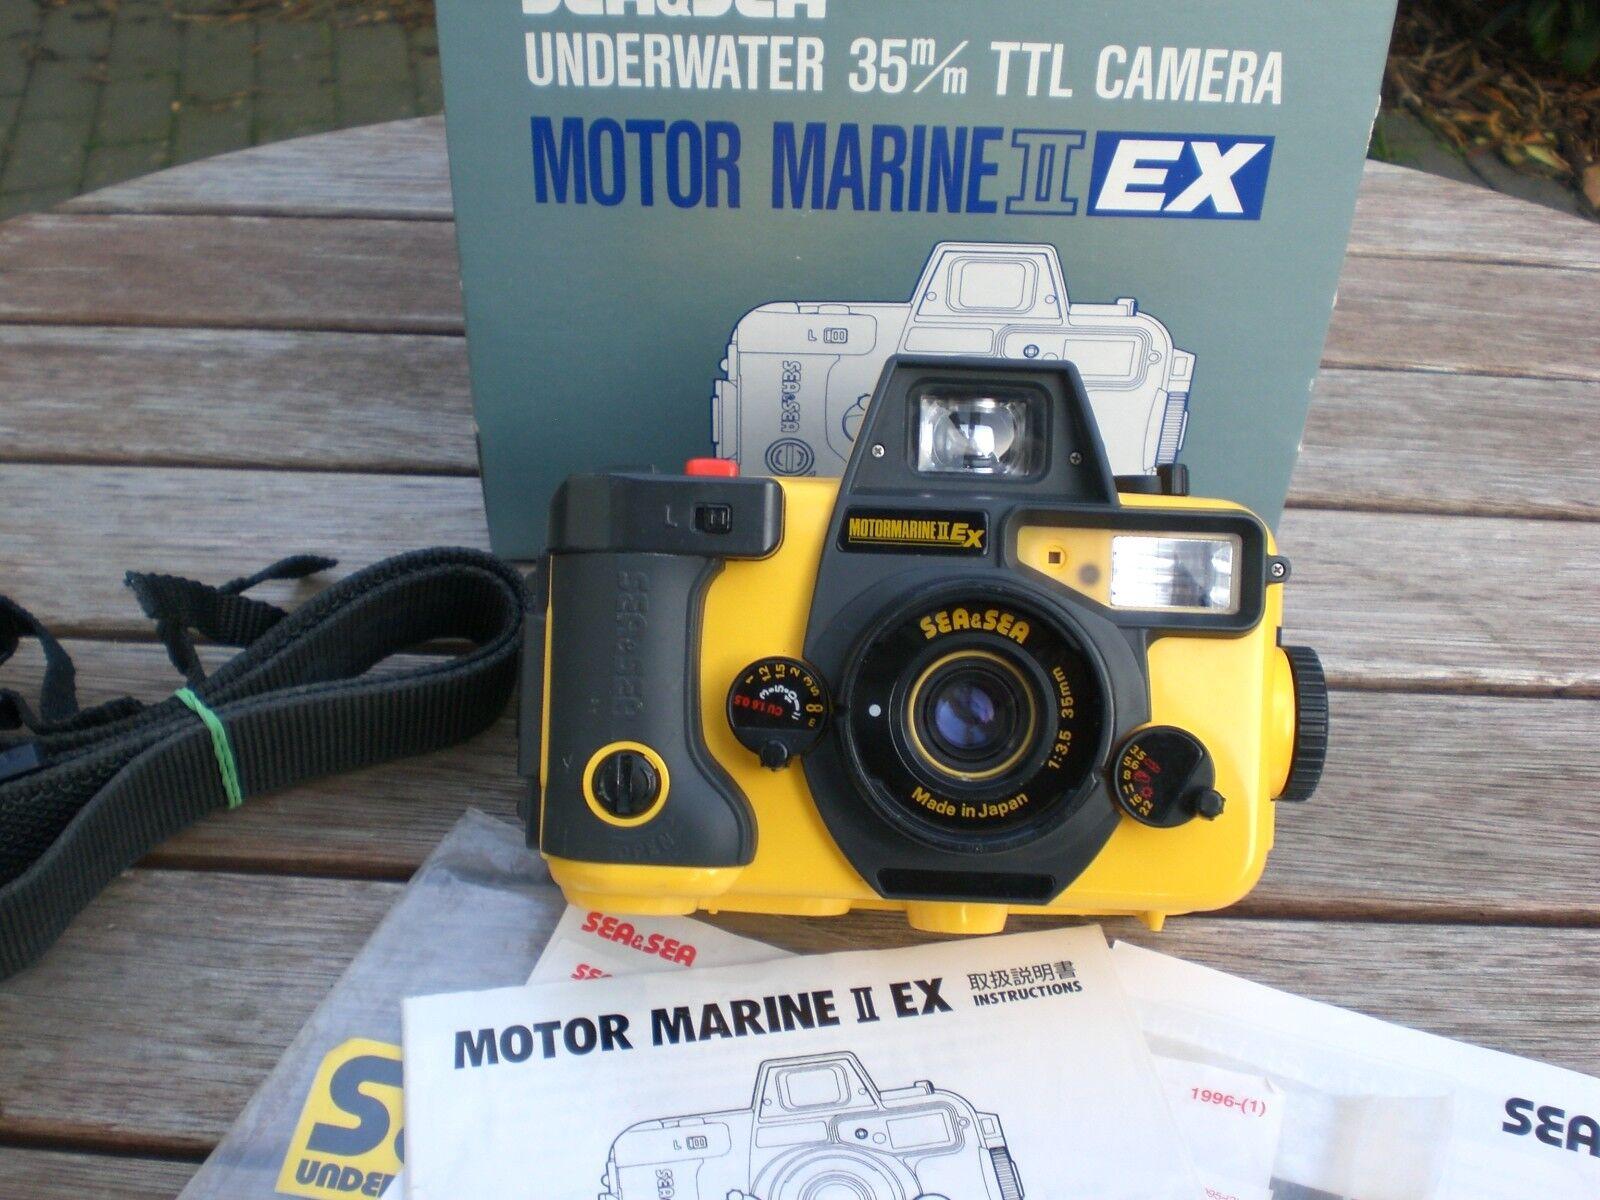 Sea & Sea Kamera MM II EX